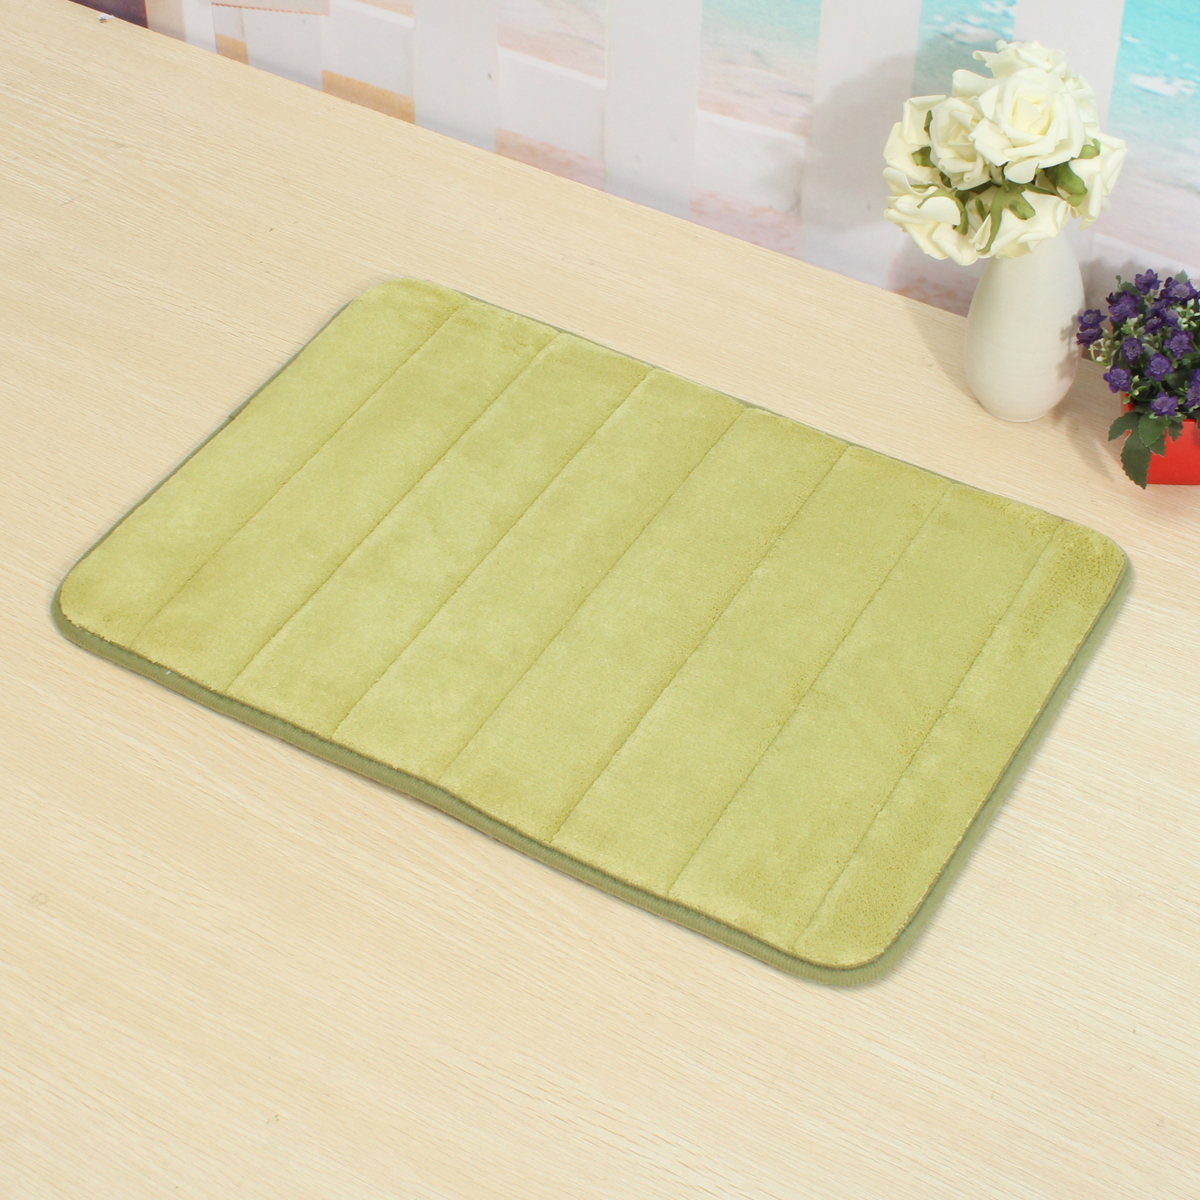 20 x32 soft absorbent memory foam mats kitchen bathroom on farmhouse colors for bath mats walmart id=26504